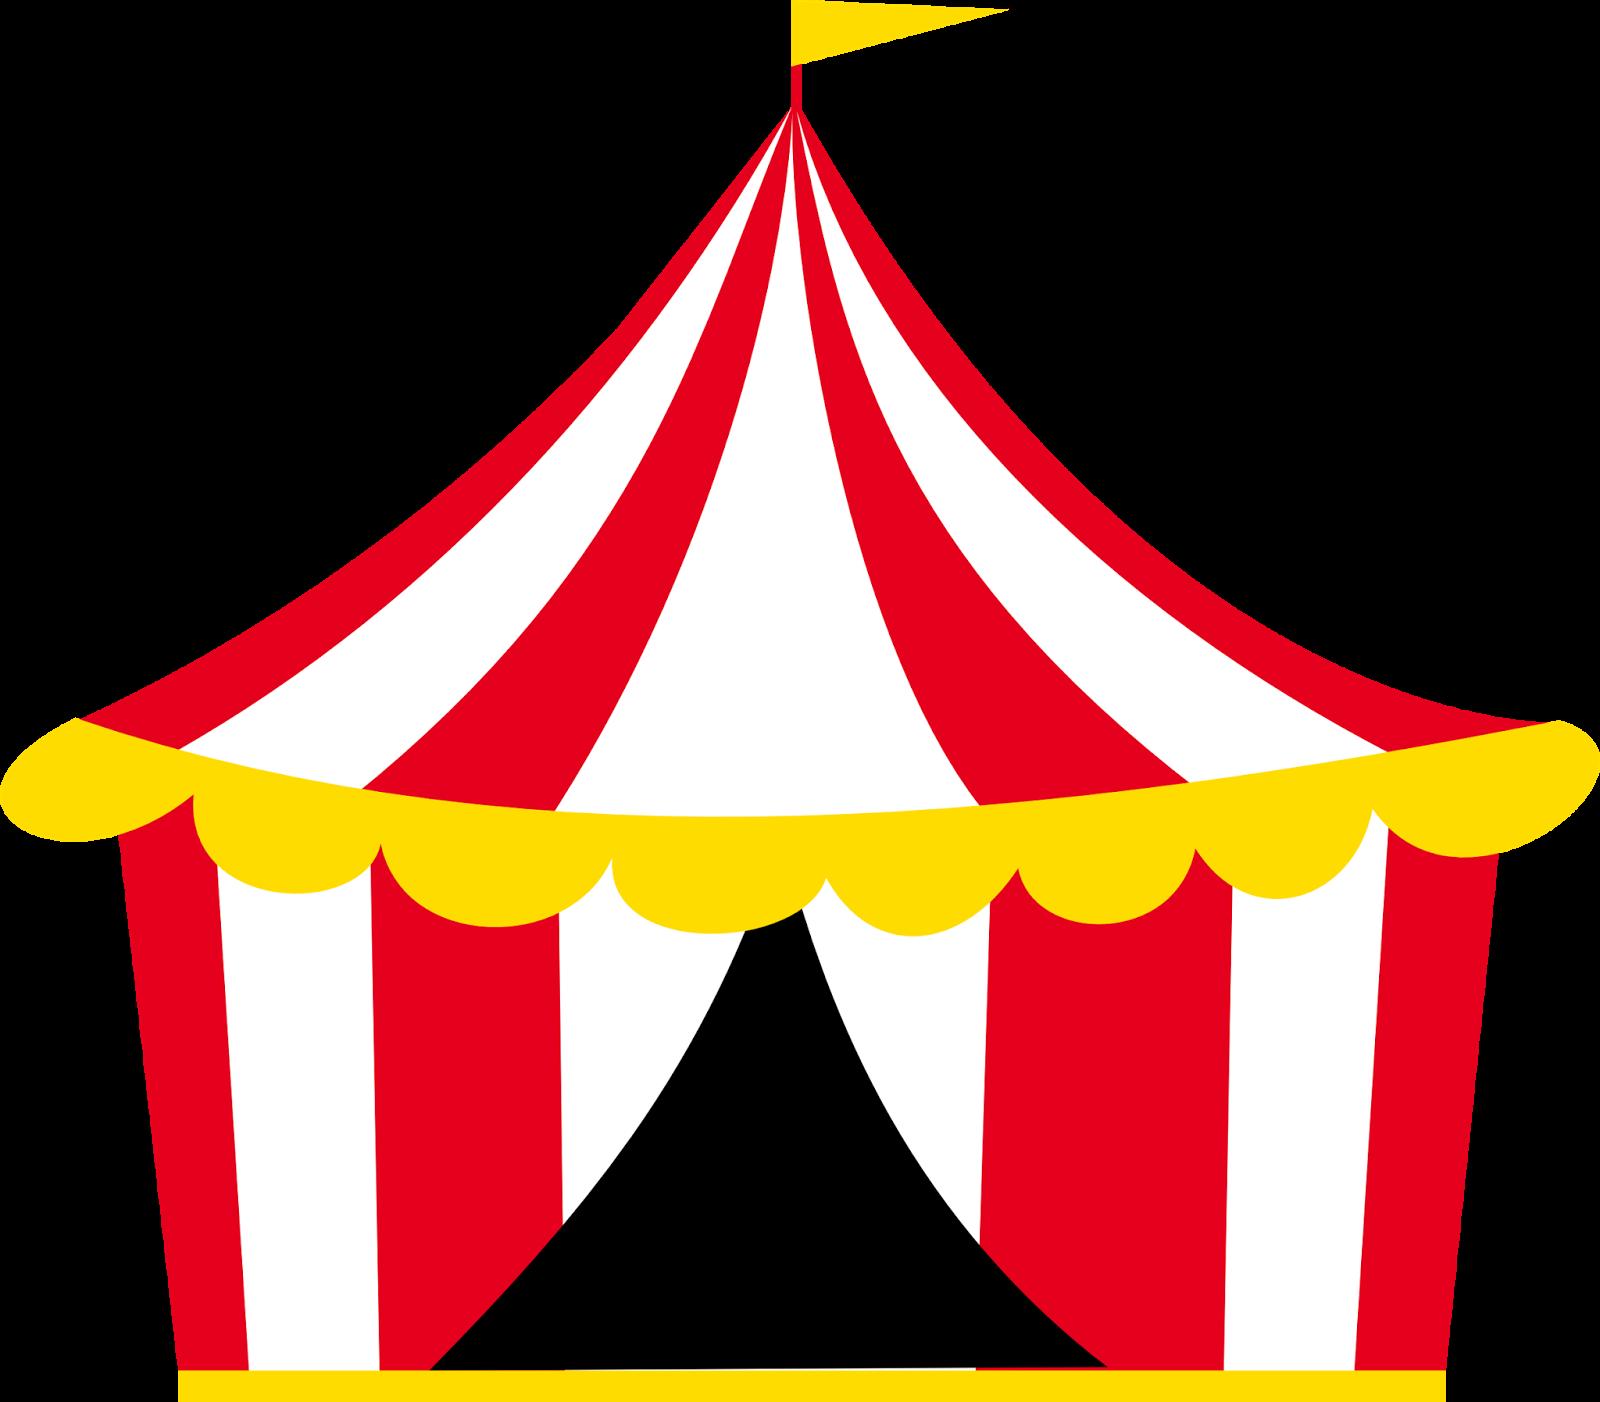 svg transparent download Tenda circo montando a. Carnival ticket booth clipart